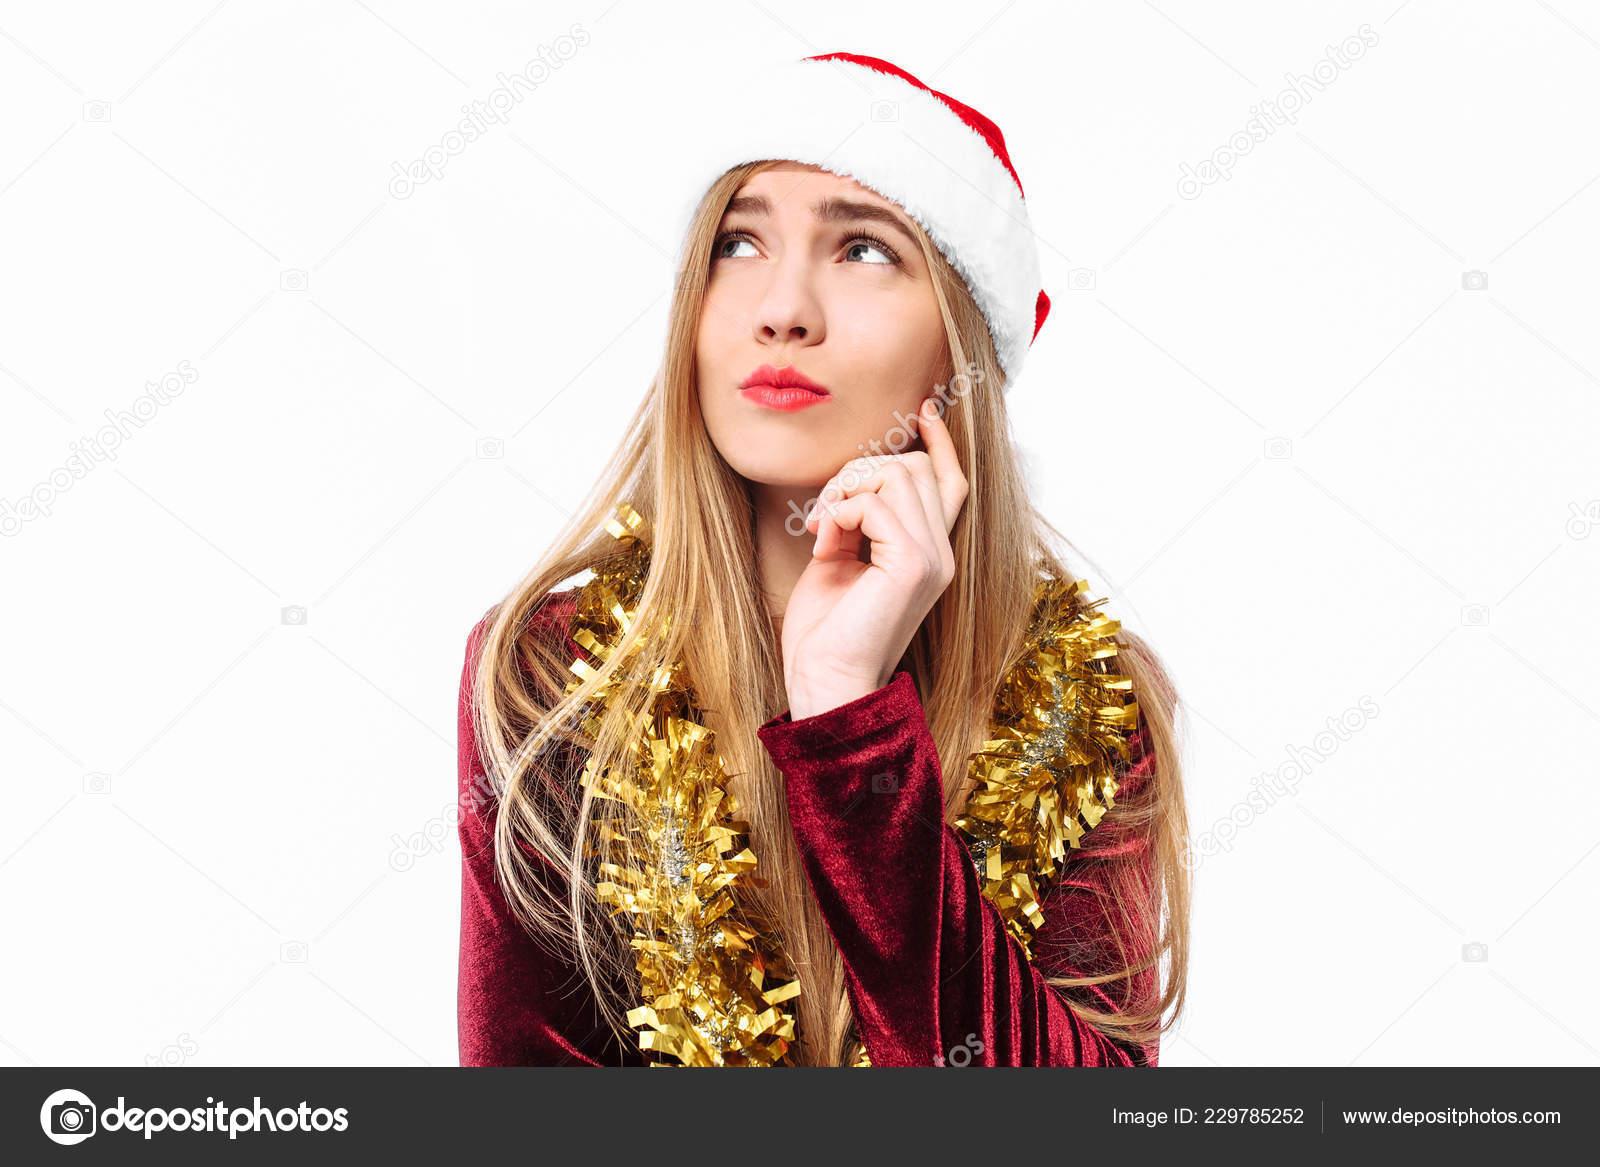 Robe Chapeau Noël Cute Dans Père Fille Belle Rêves Semble 1TKlFJc